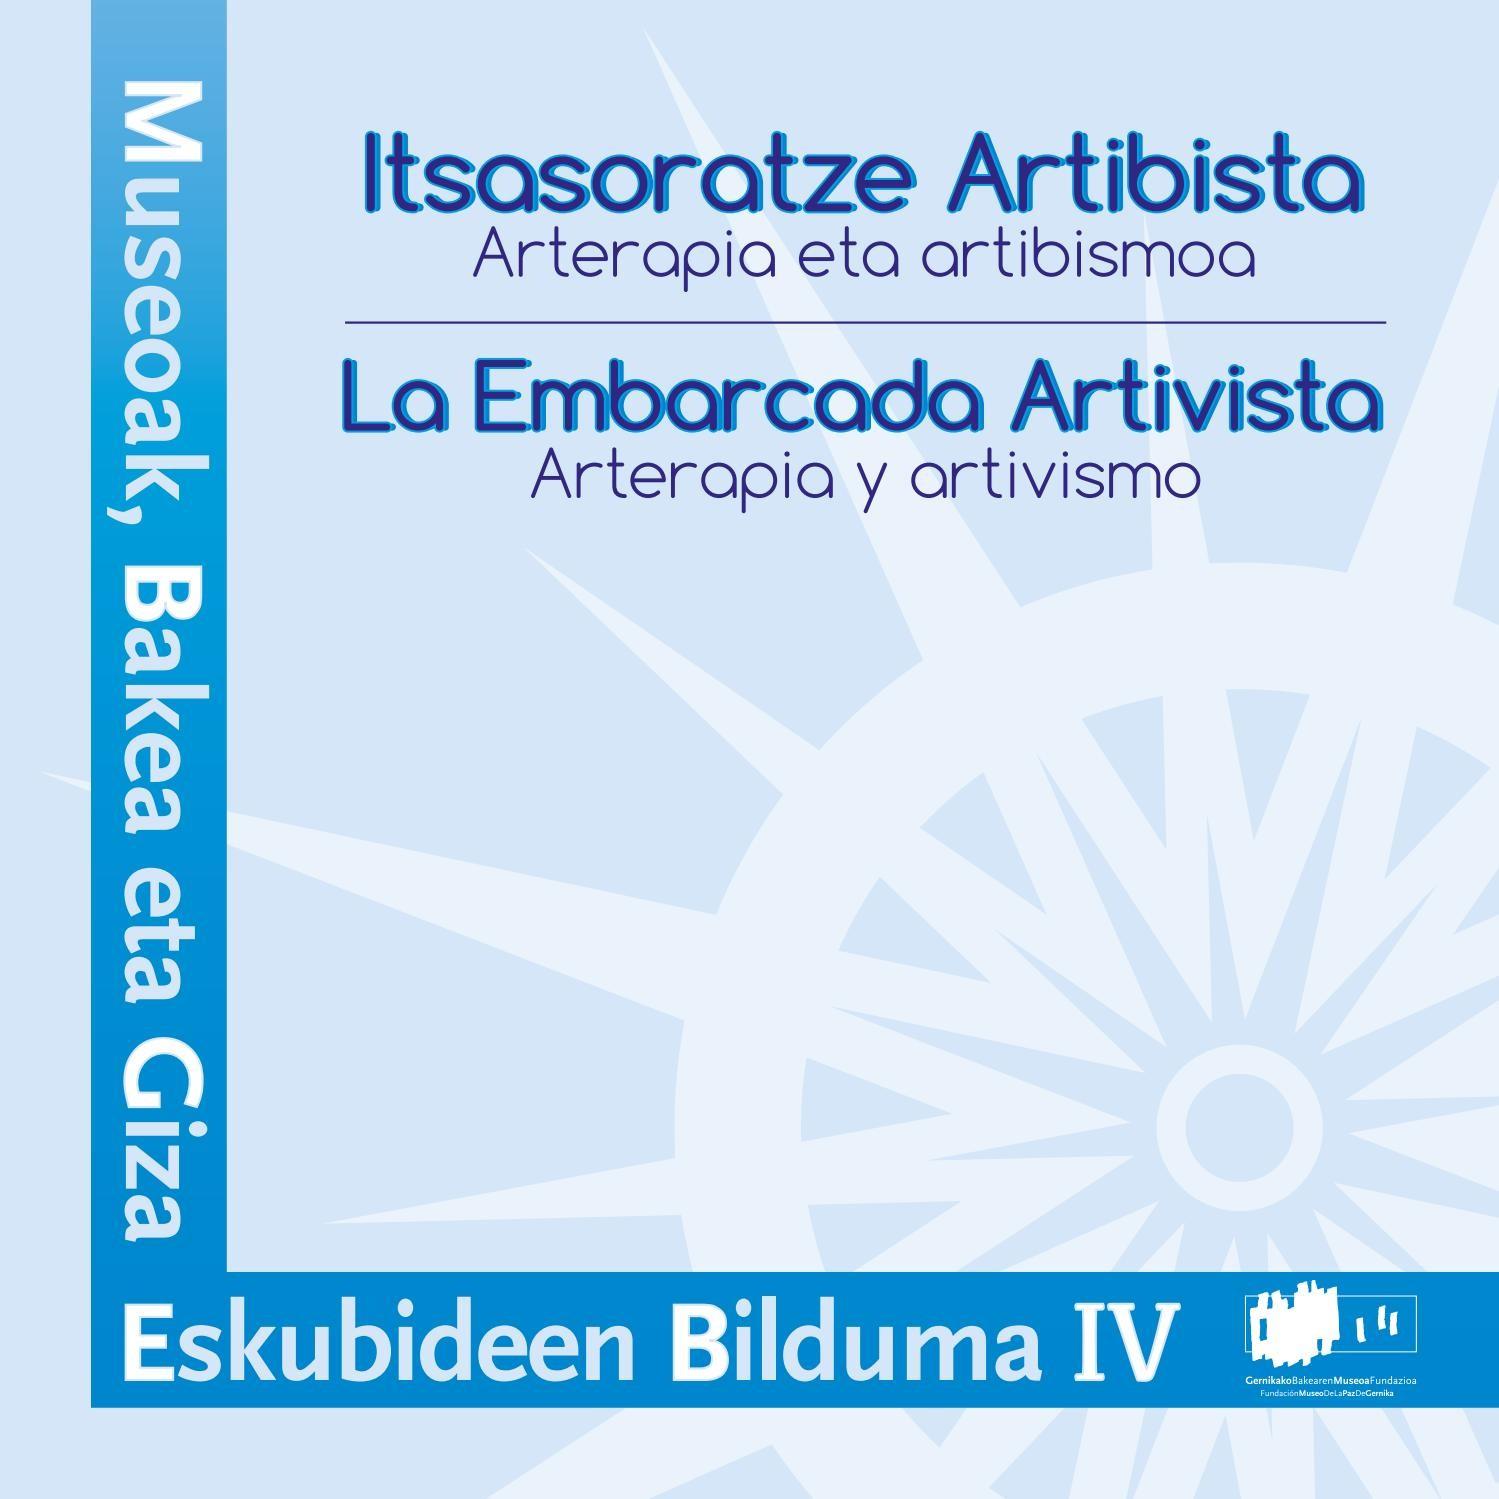 Borrador Calendario Escolar 2019 Galicia Recientes Embarcada Artivista Itsasoratze Artibista by Museo De La Paz De